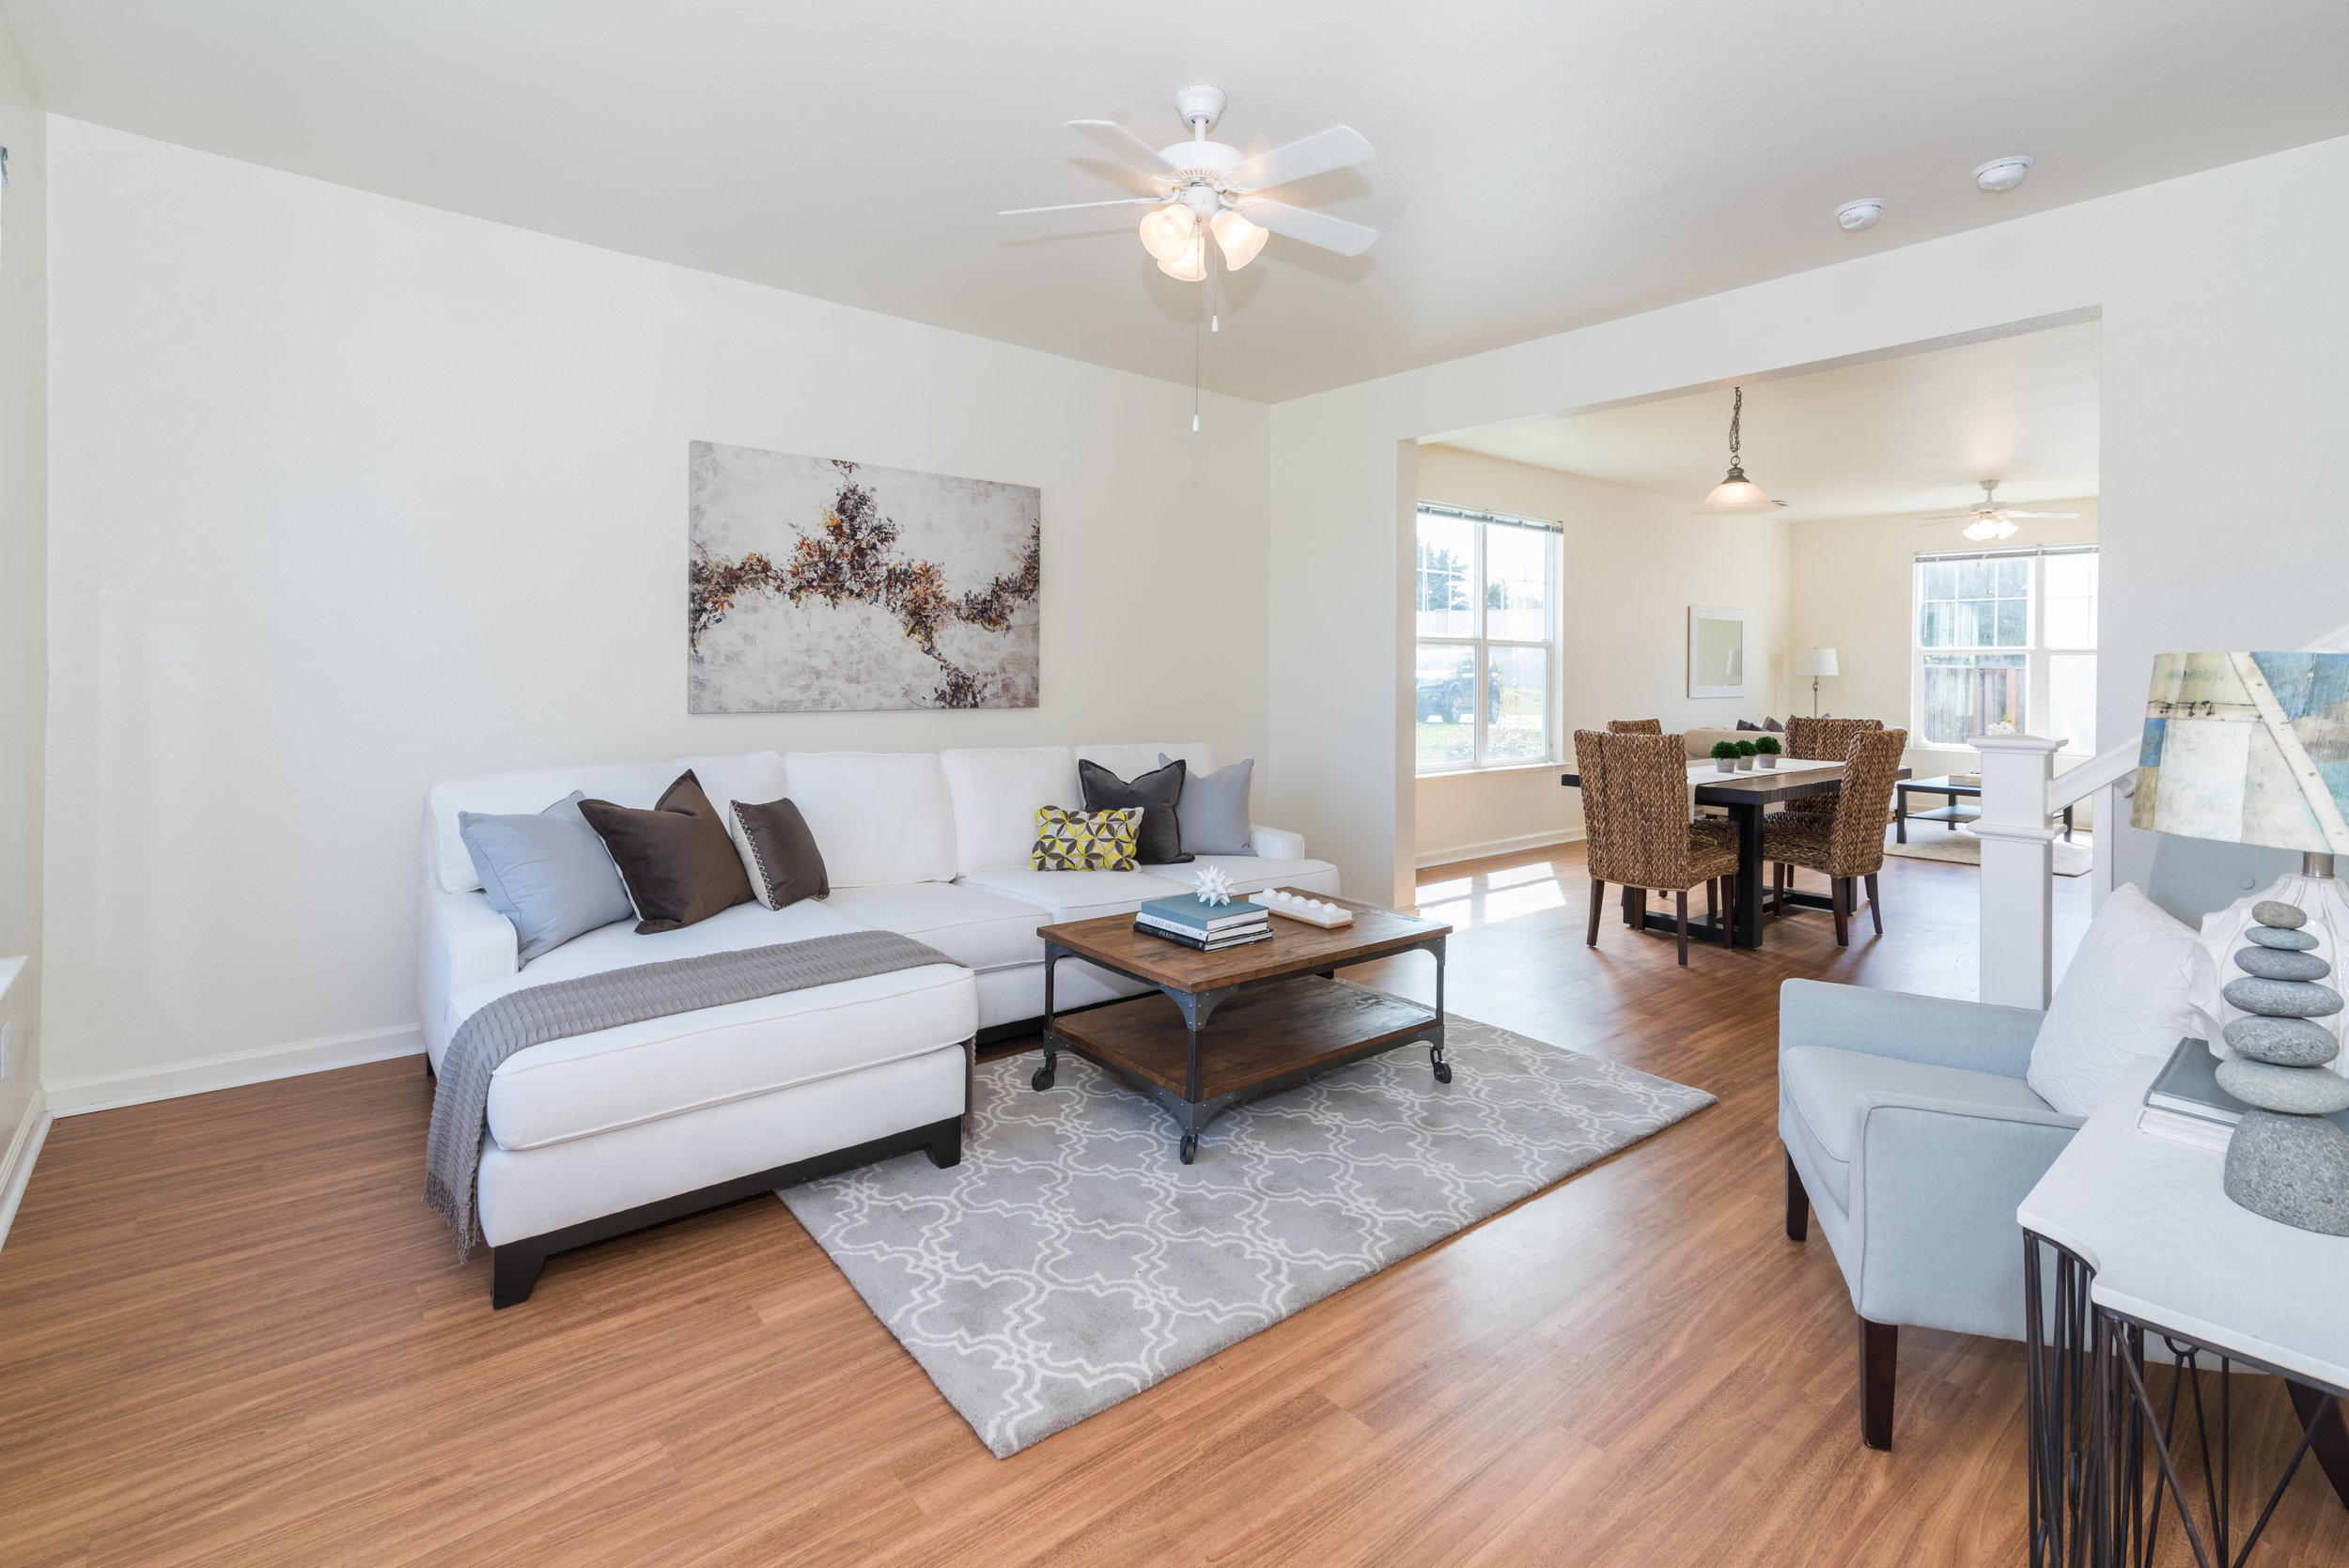 Living Room in Rental Home